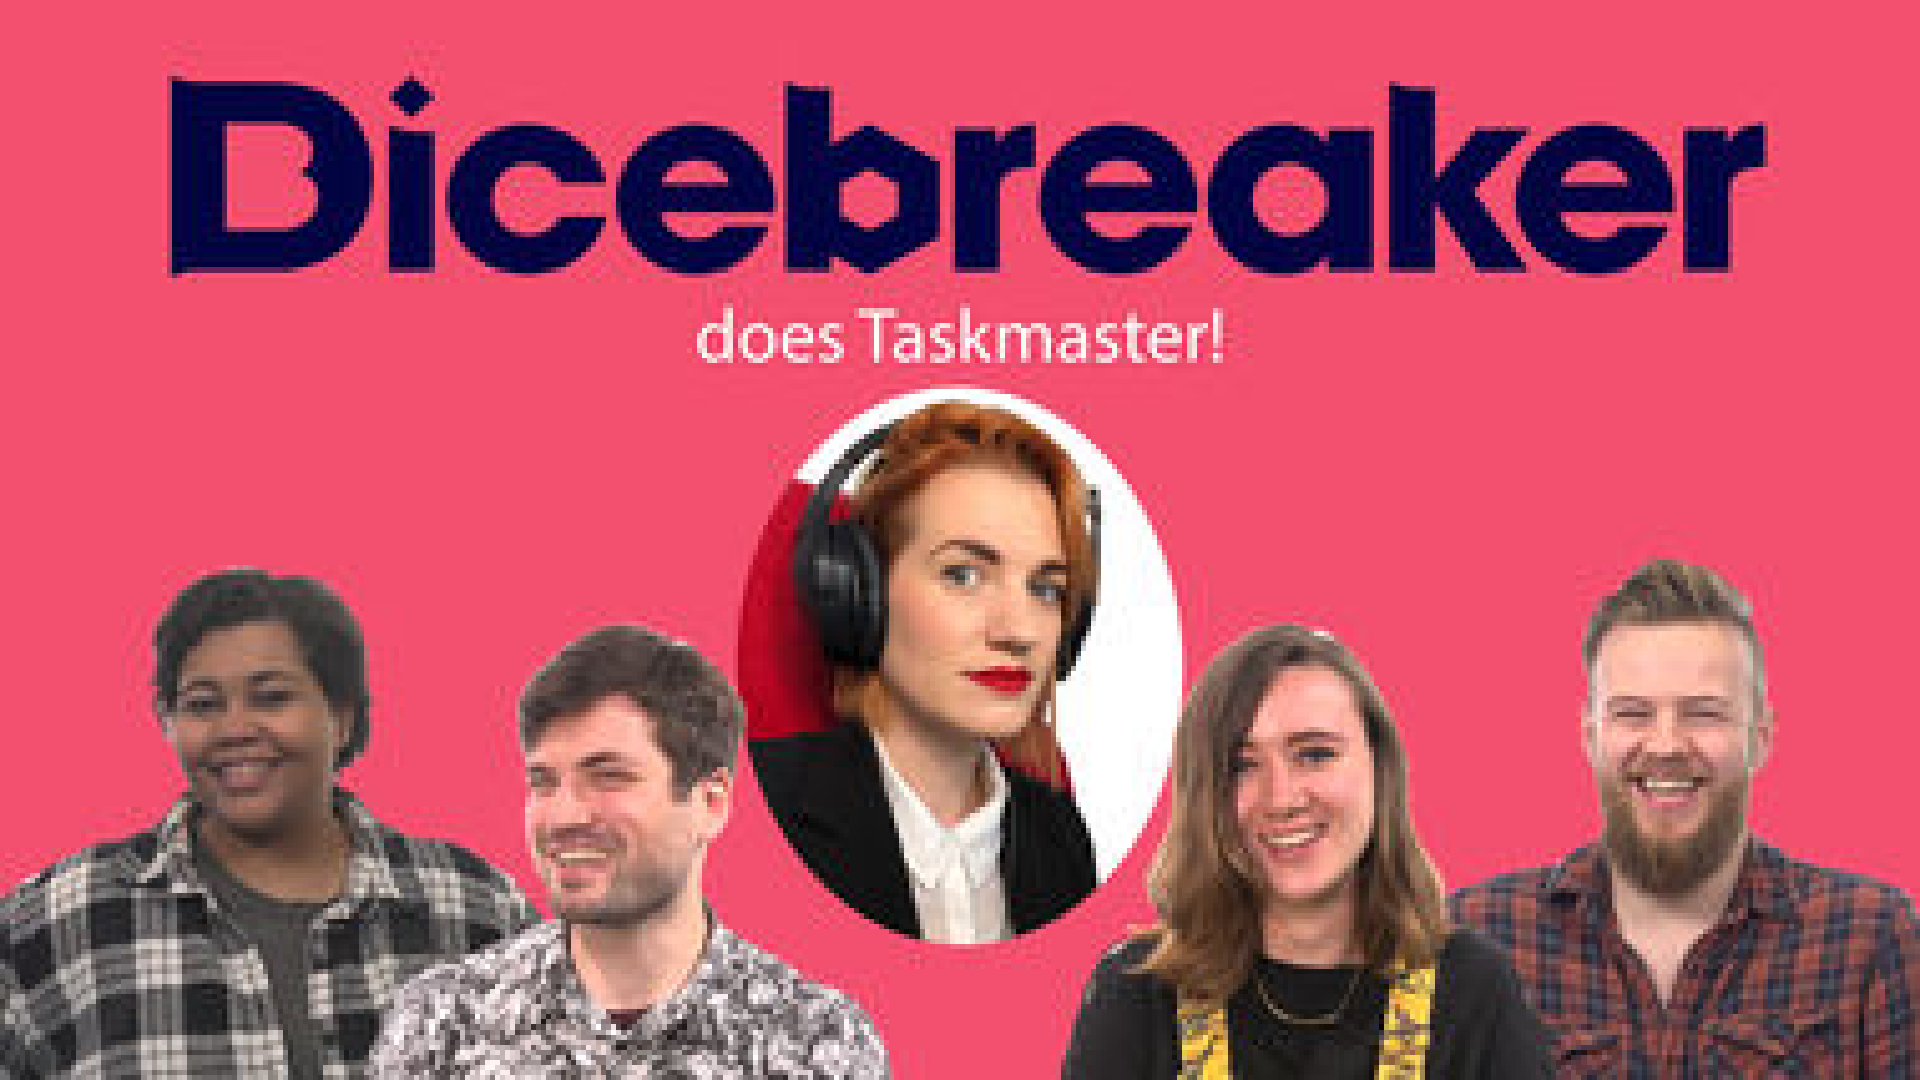 Image for We made our own Taskmaster Tasks! Dicebreaker does Taskmaster